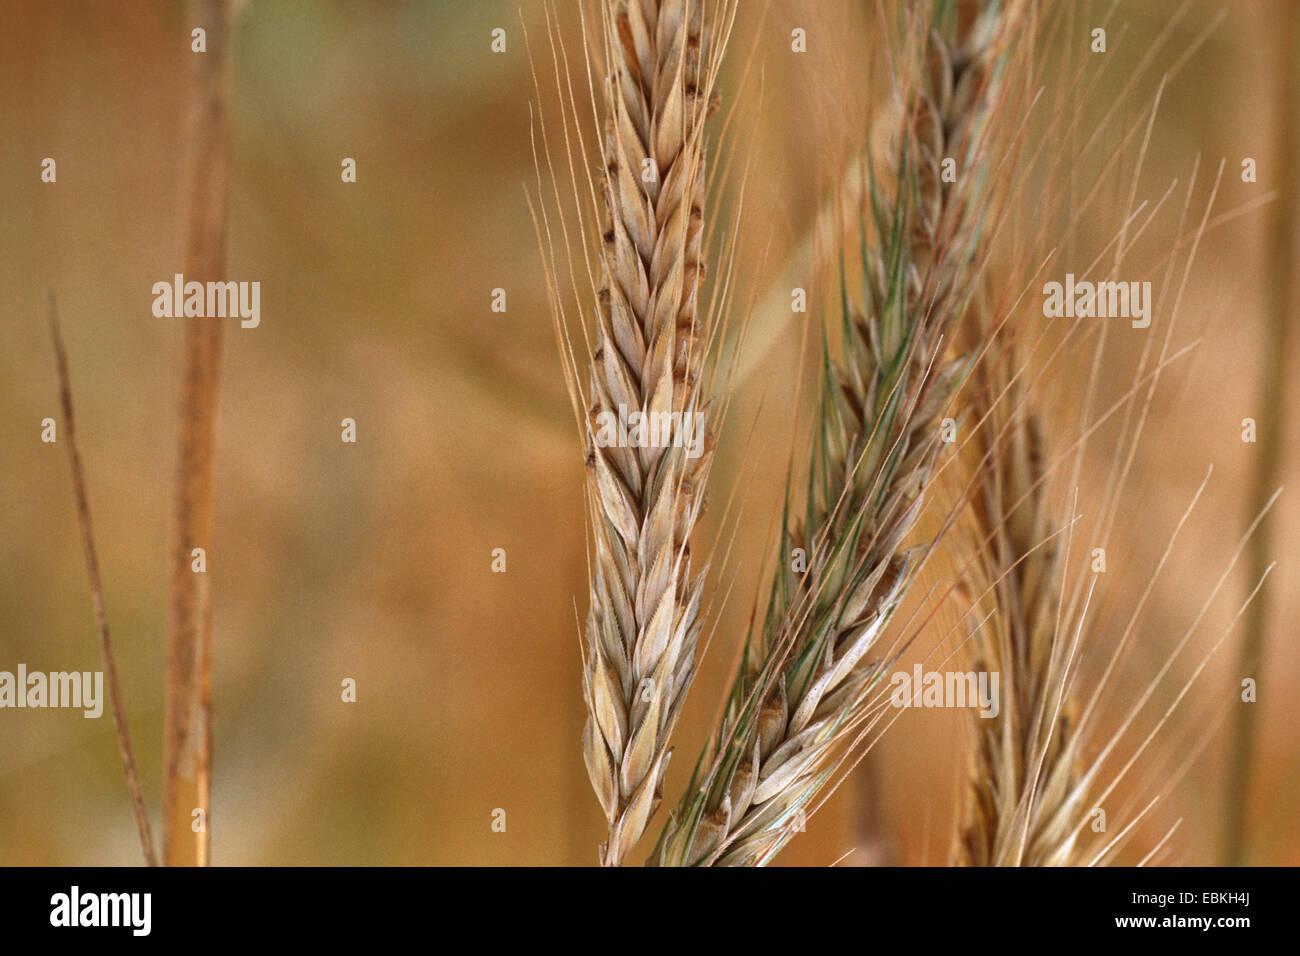 rye species (Secale vavilovii), spikes - Stock Image